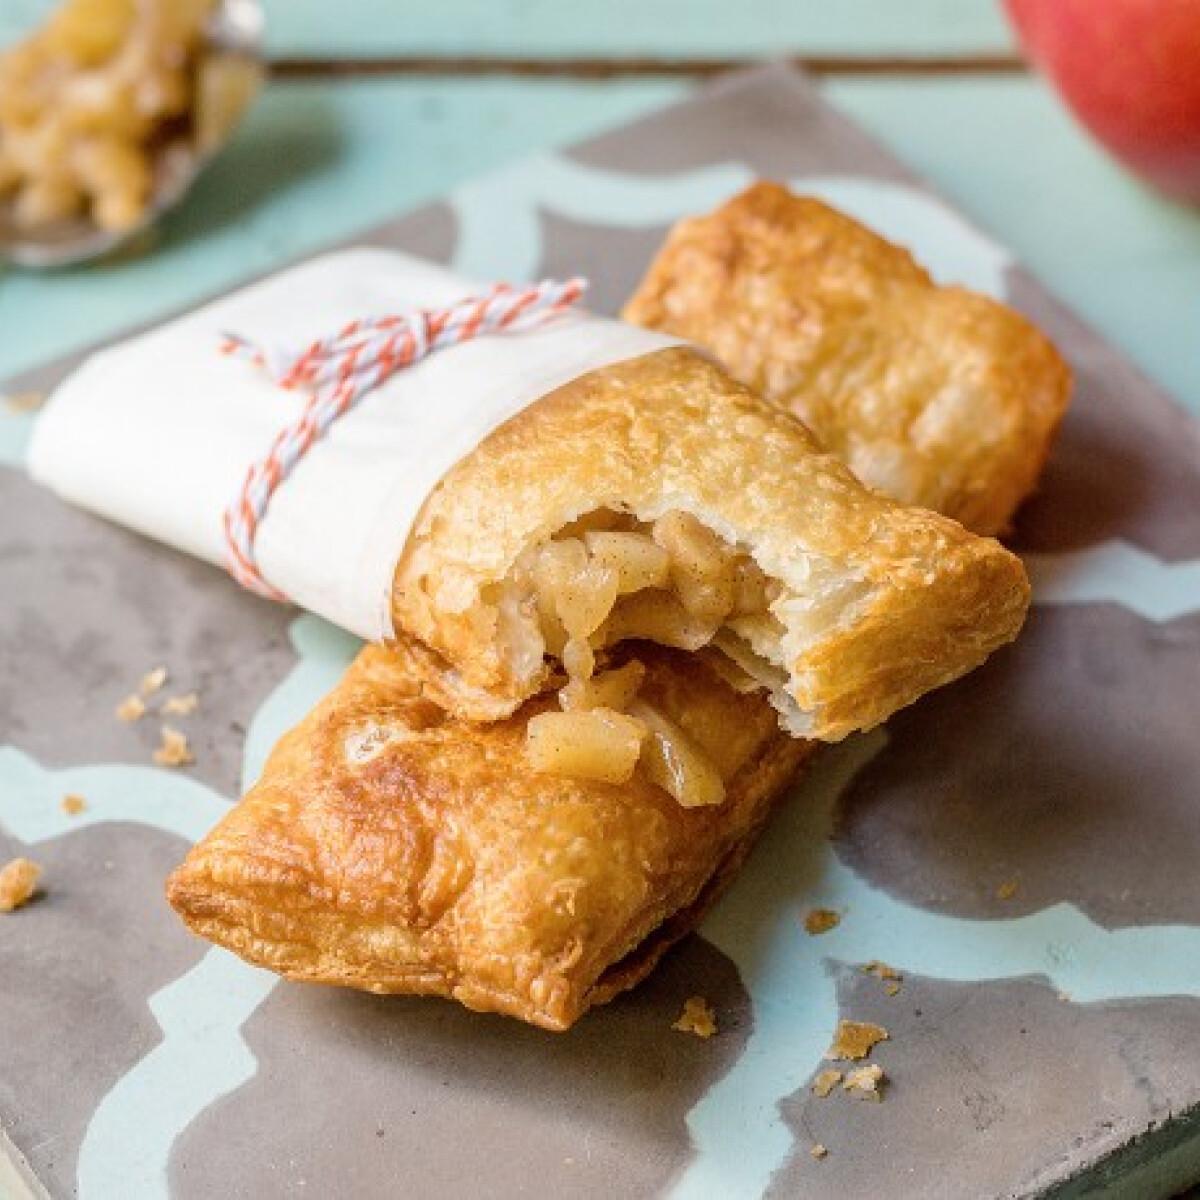 Ezen a képen: Mekis almás pite